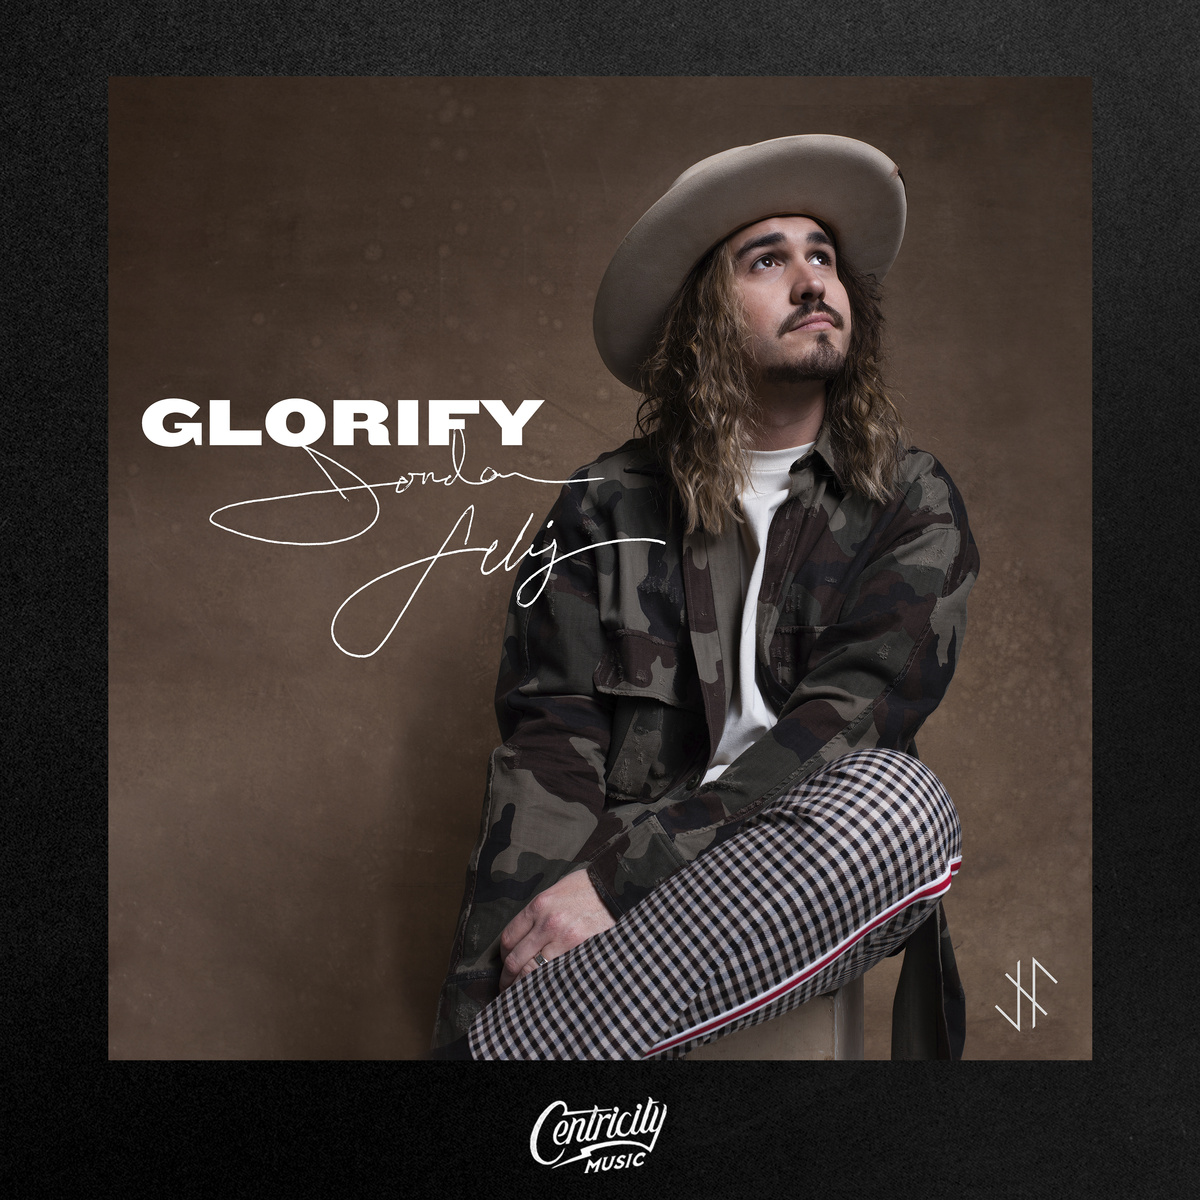 Glorify - Glorify